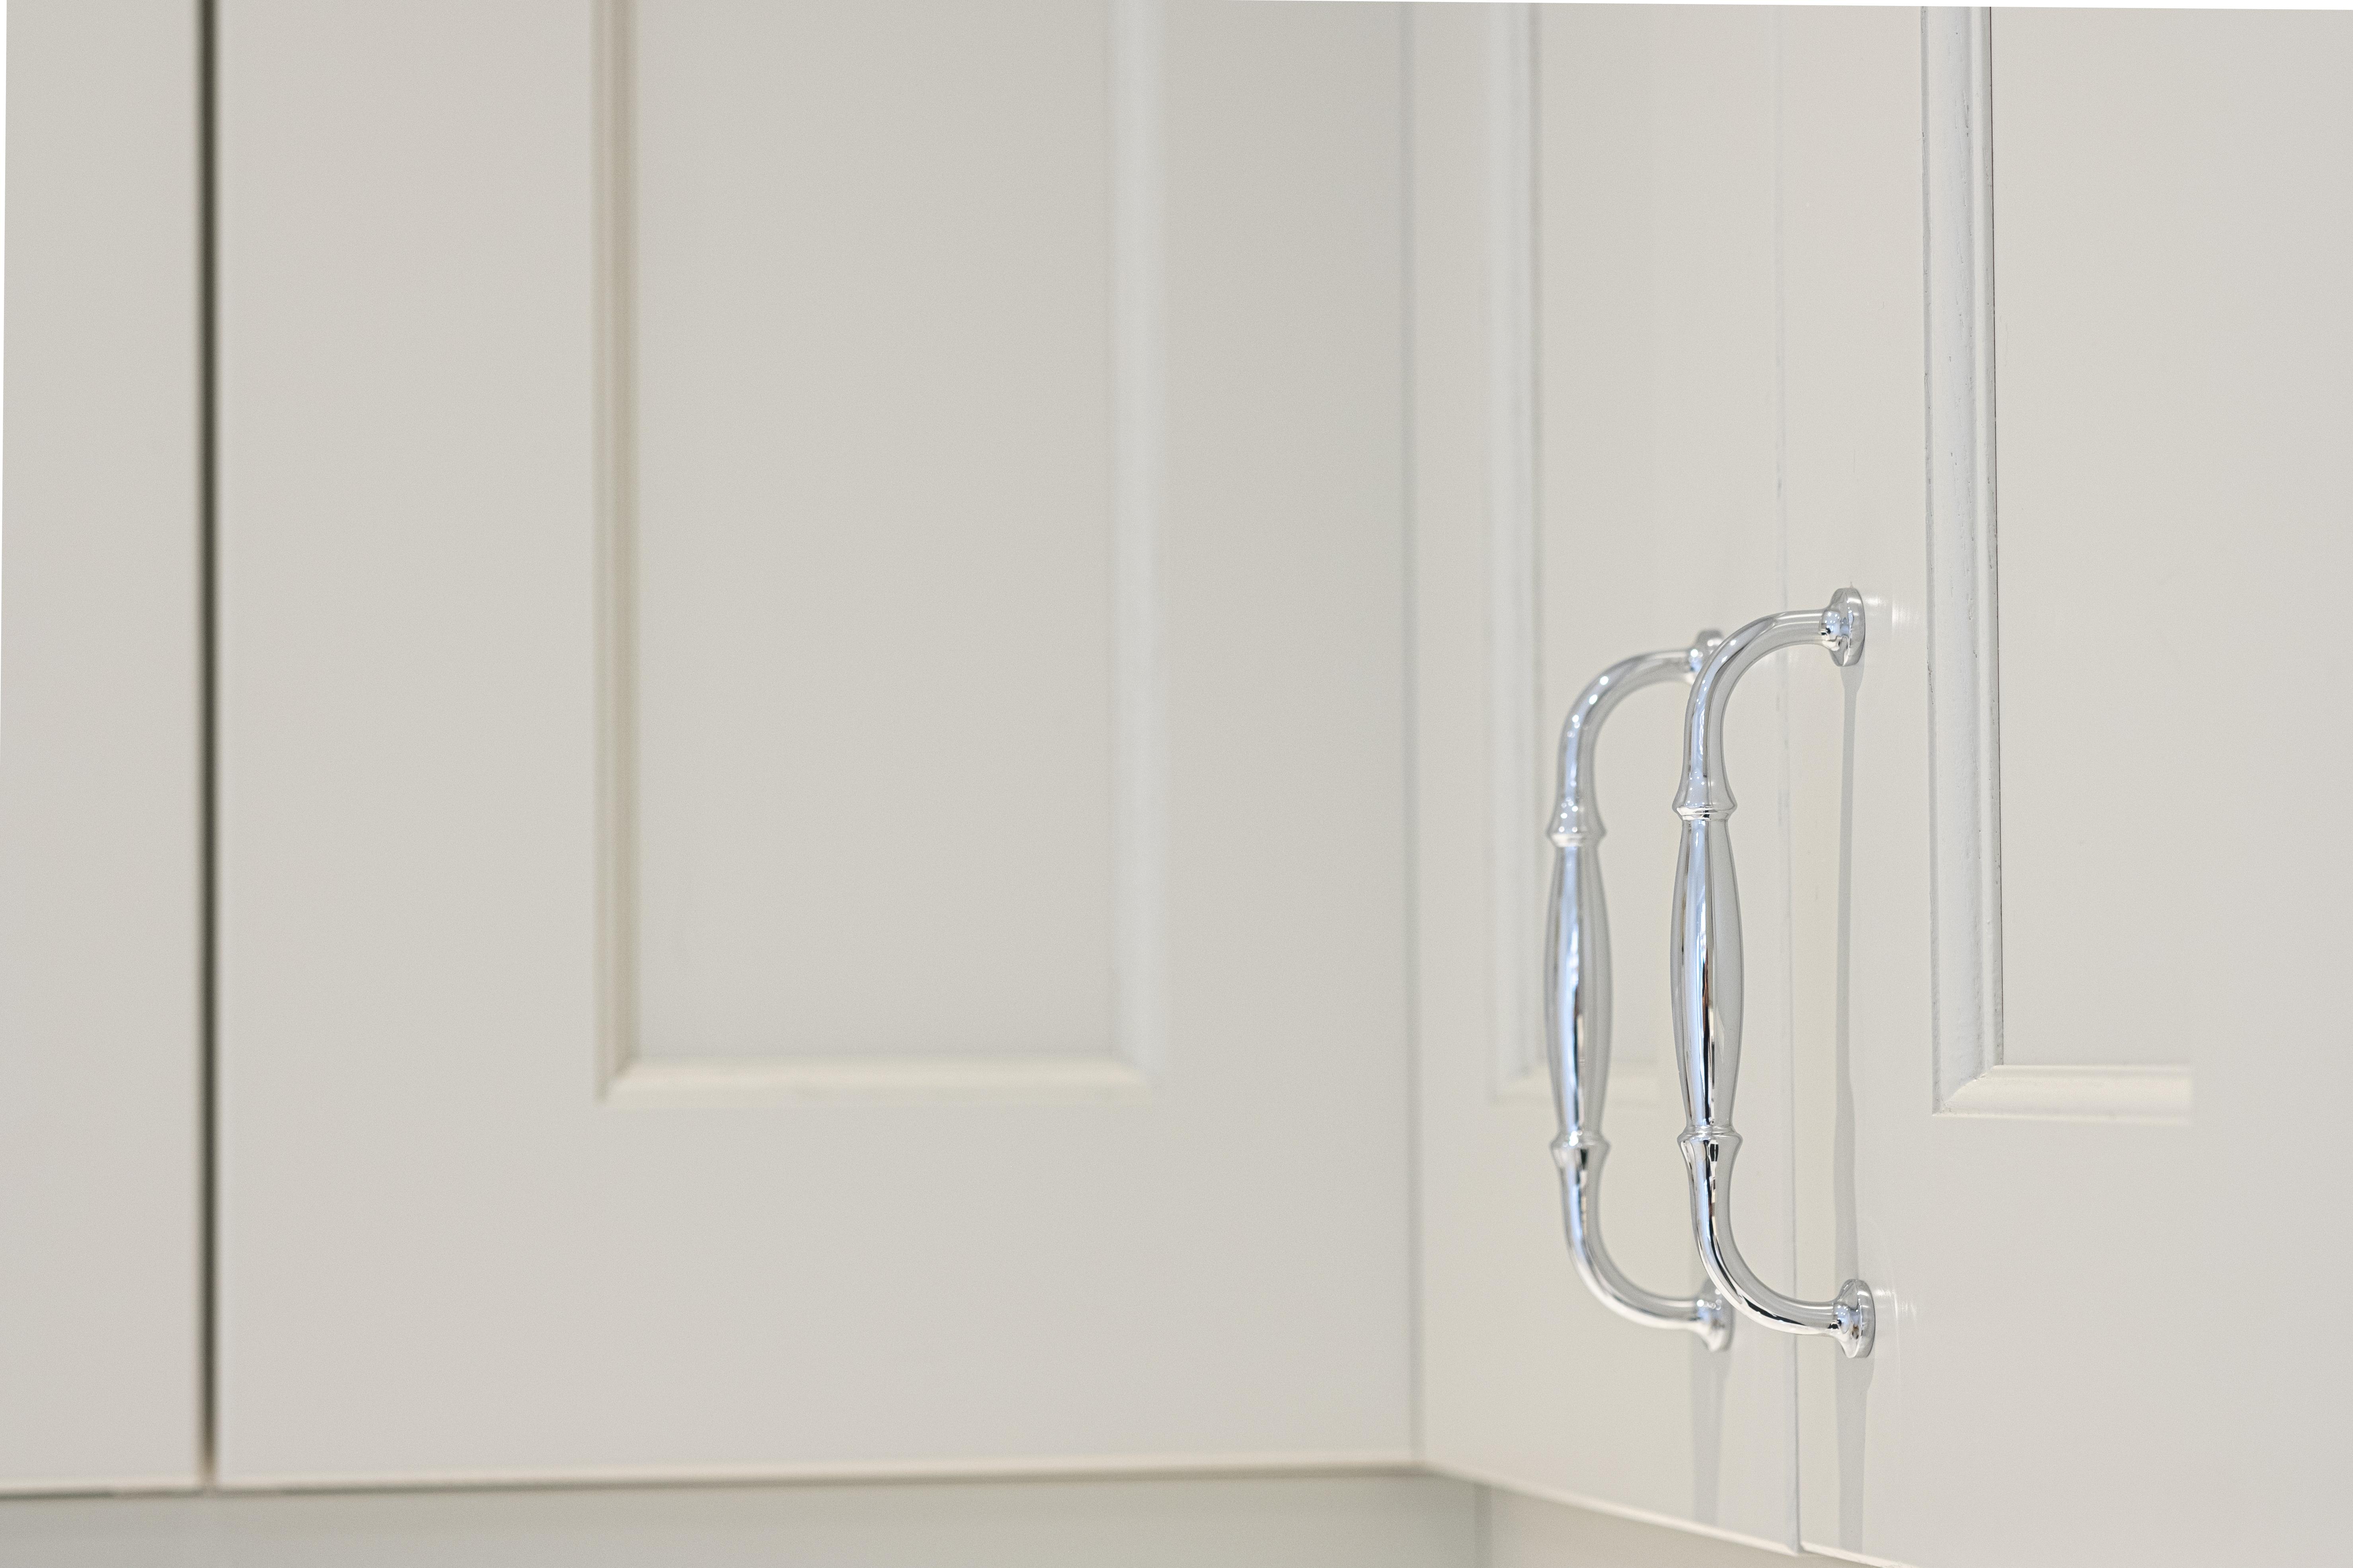 Mussel Shaker kitchen by Charmaine ULYATE | Raison Home UK - 5